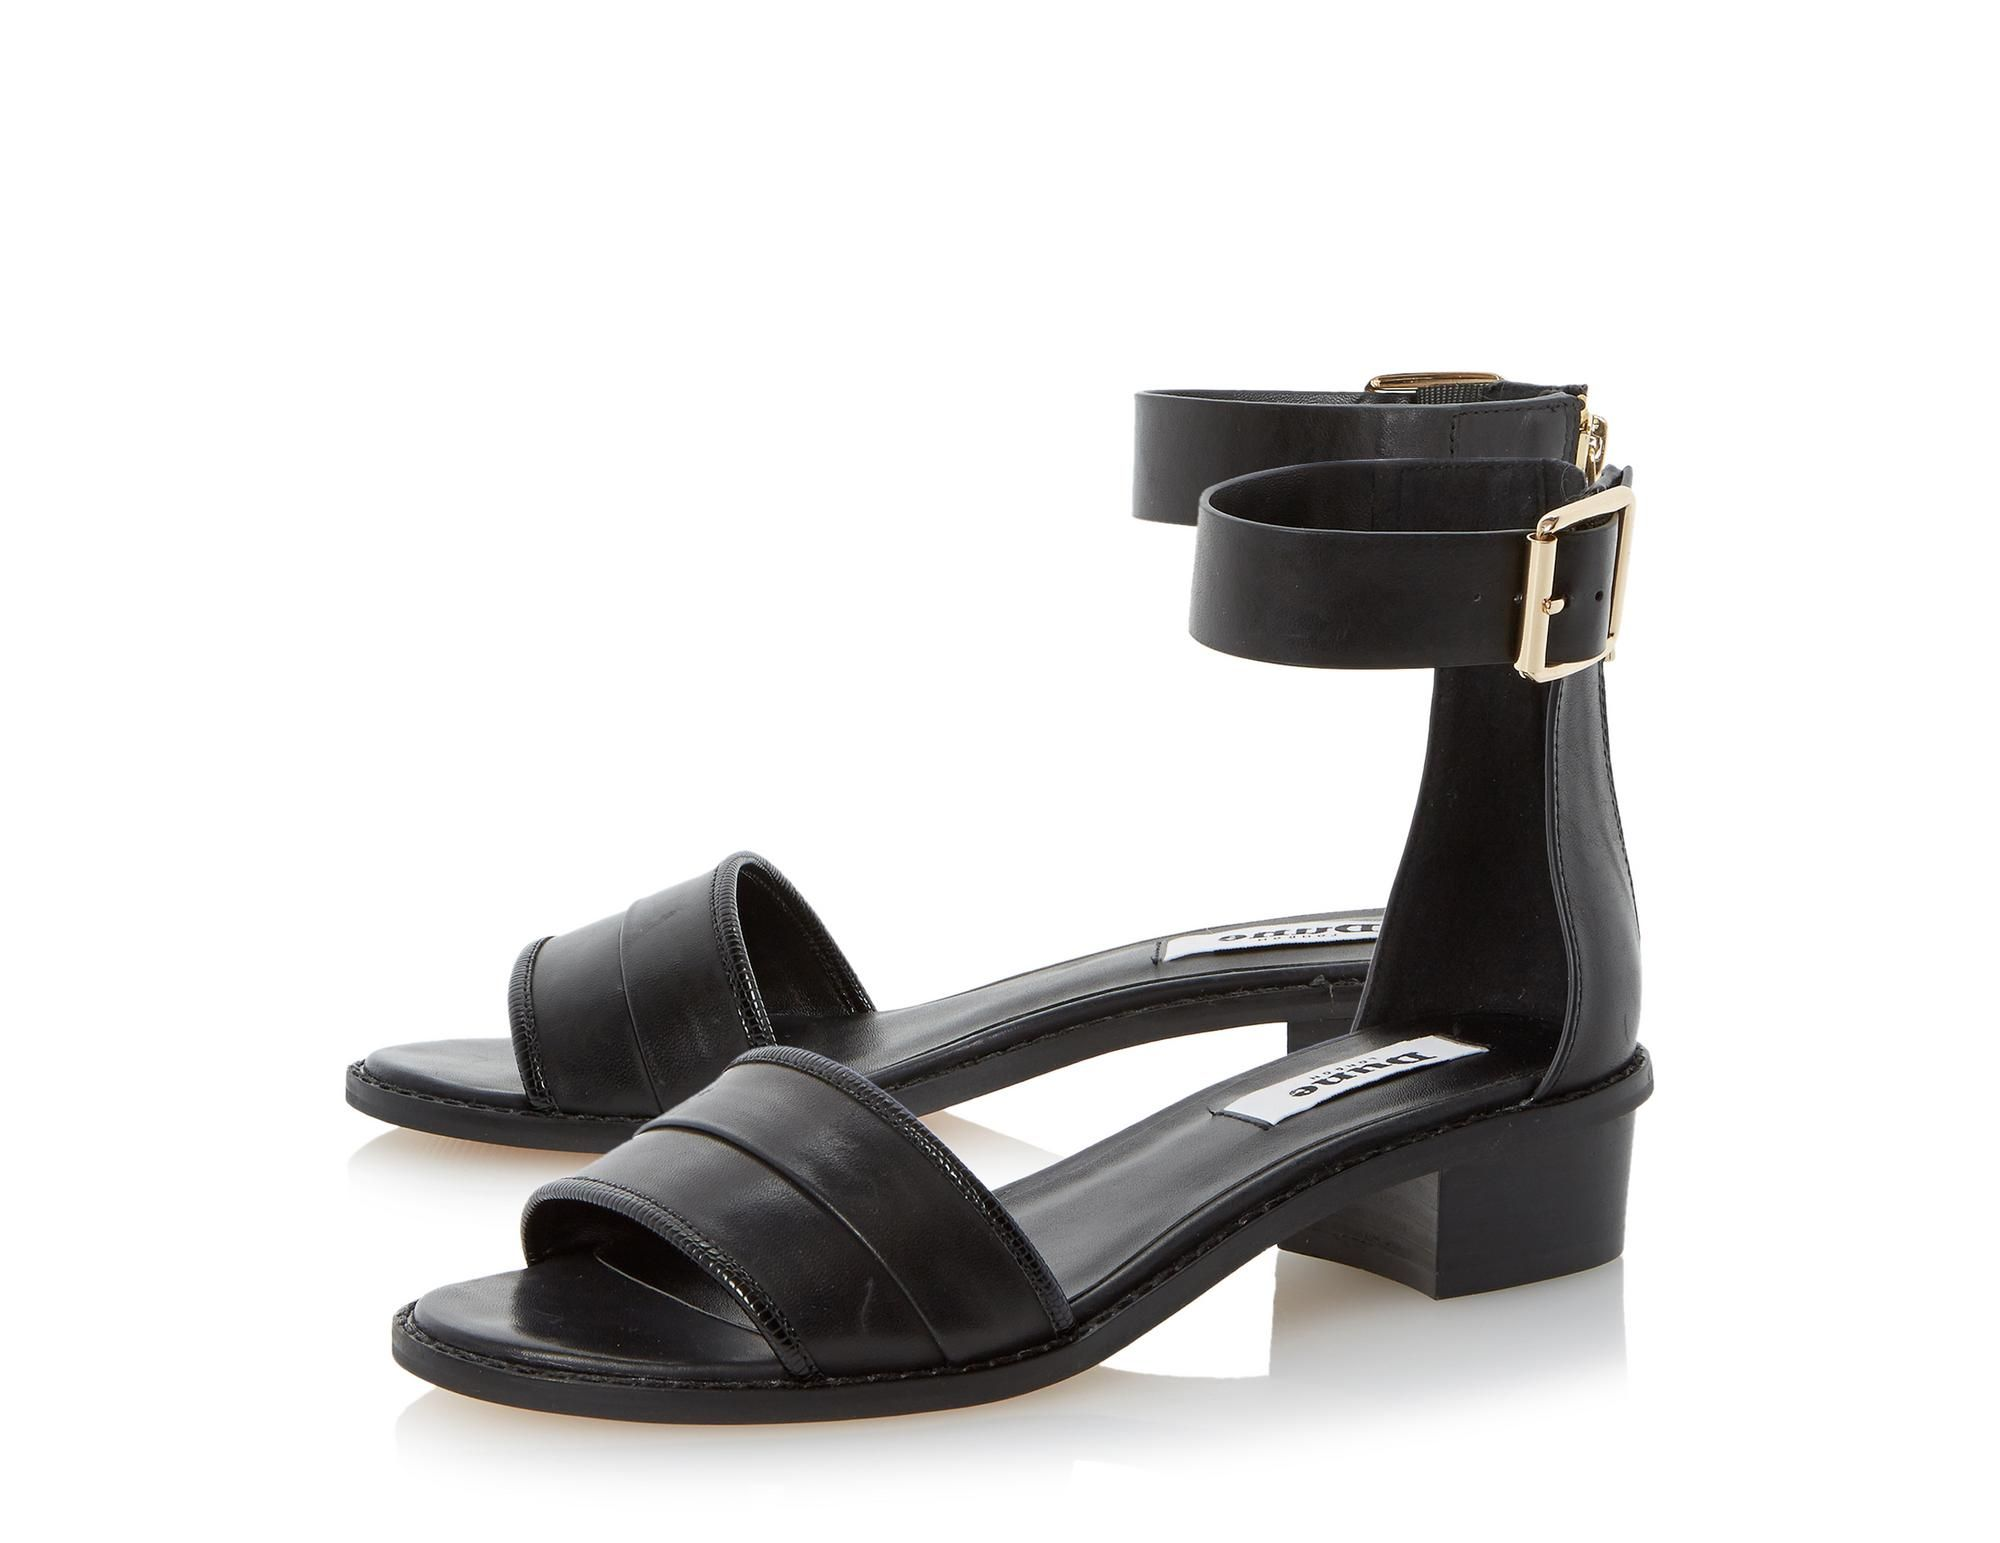 Black leather sandals low heel - Dune Ladies Jools Low Block Heel Ankle Strap Leather Sandal Black Dune Shoes